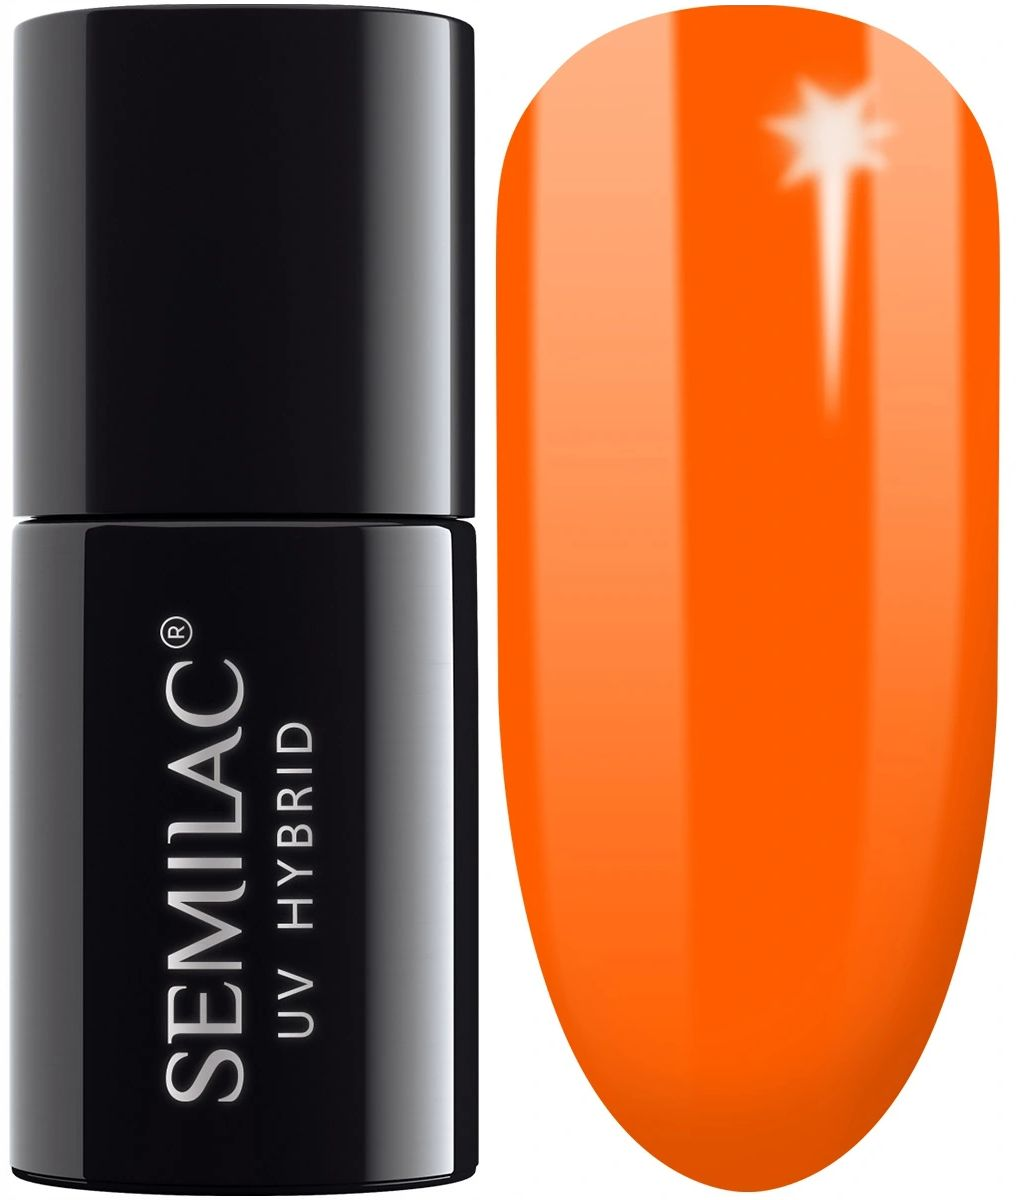 Semilac 566 Neon Orange lakier hybrydowy 7ml